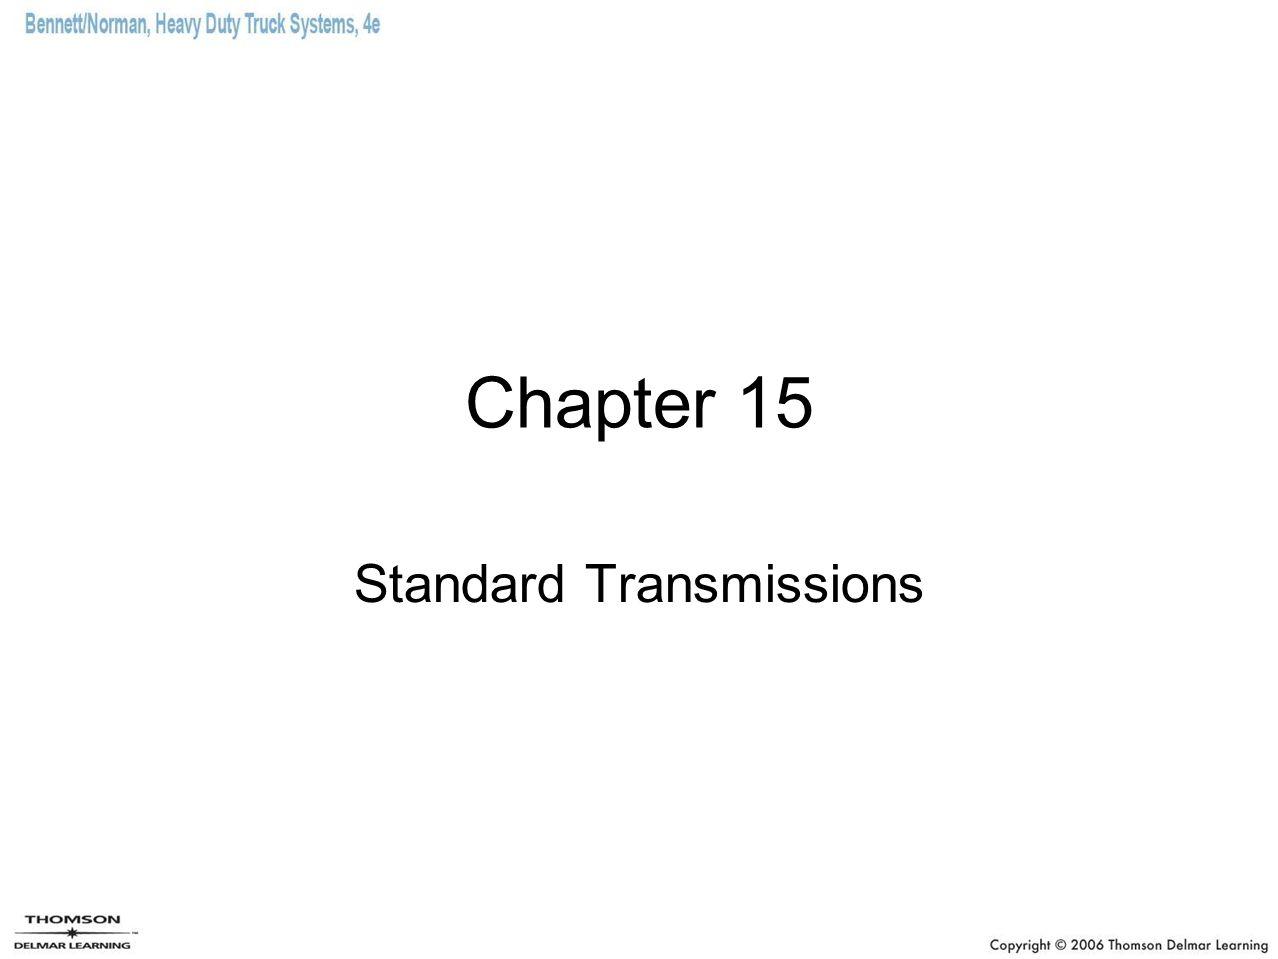 Standard Transmissions